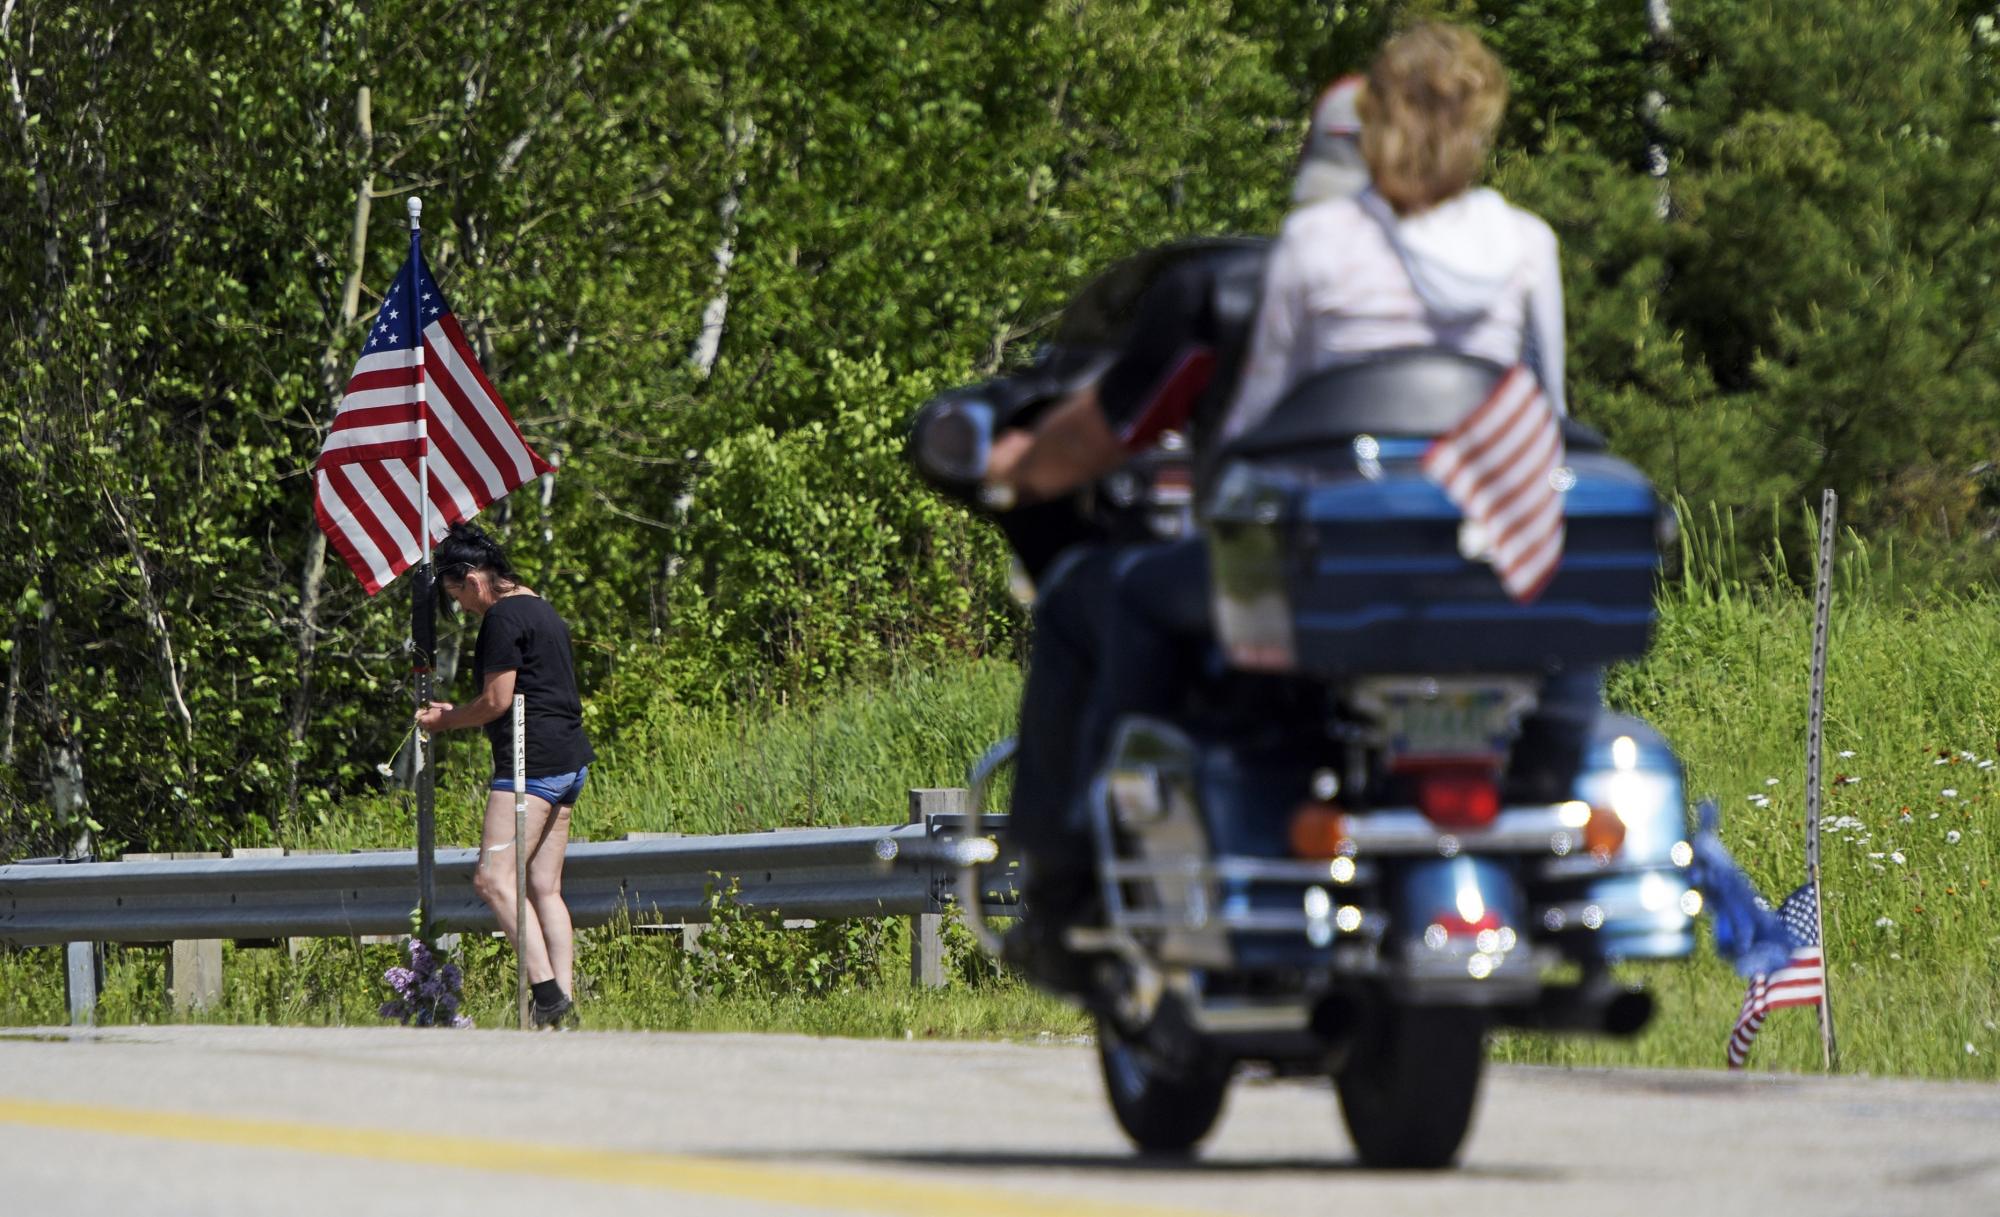 Bikers bid goodbye to 7 motorcyclists killed in crash | WTOP